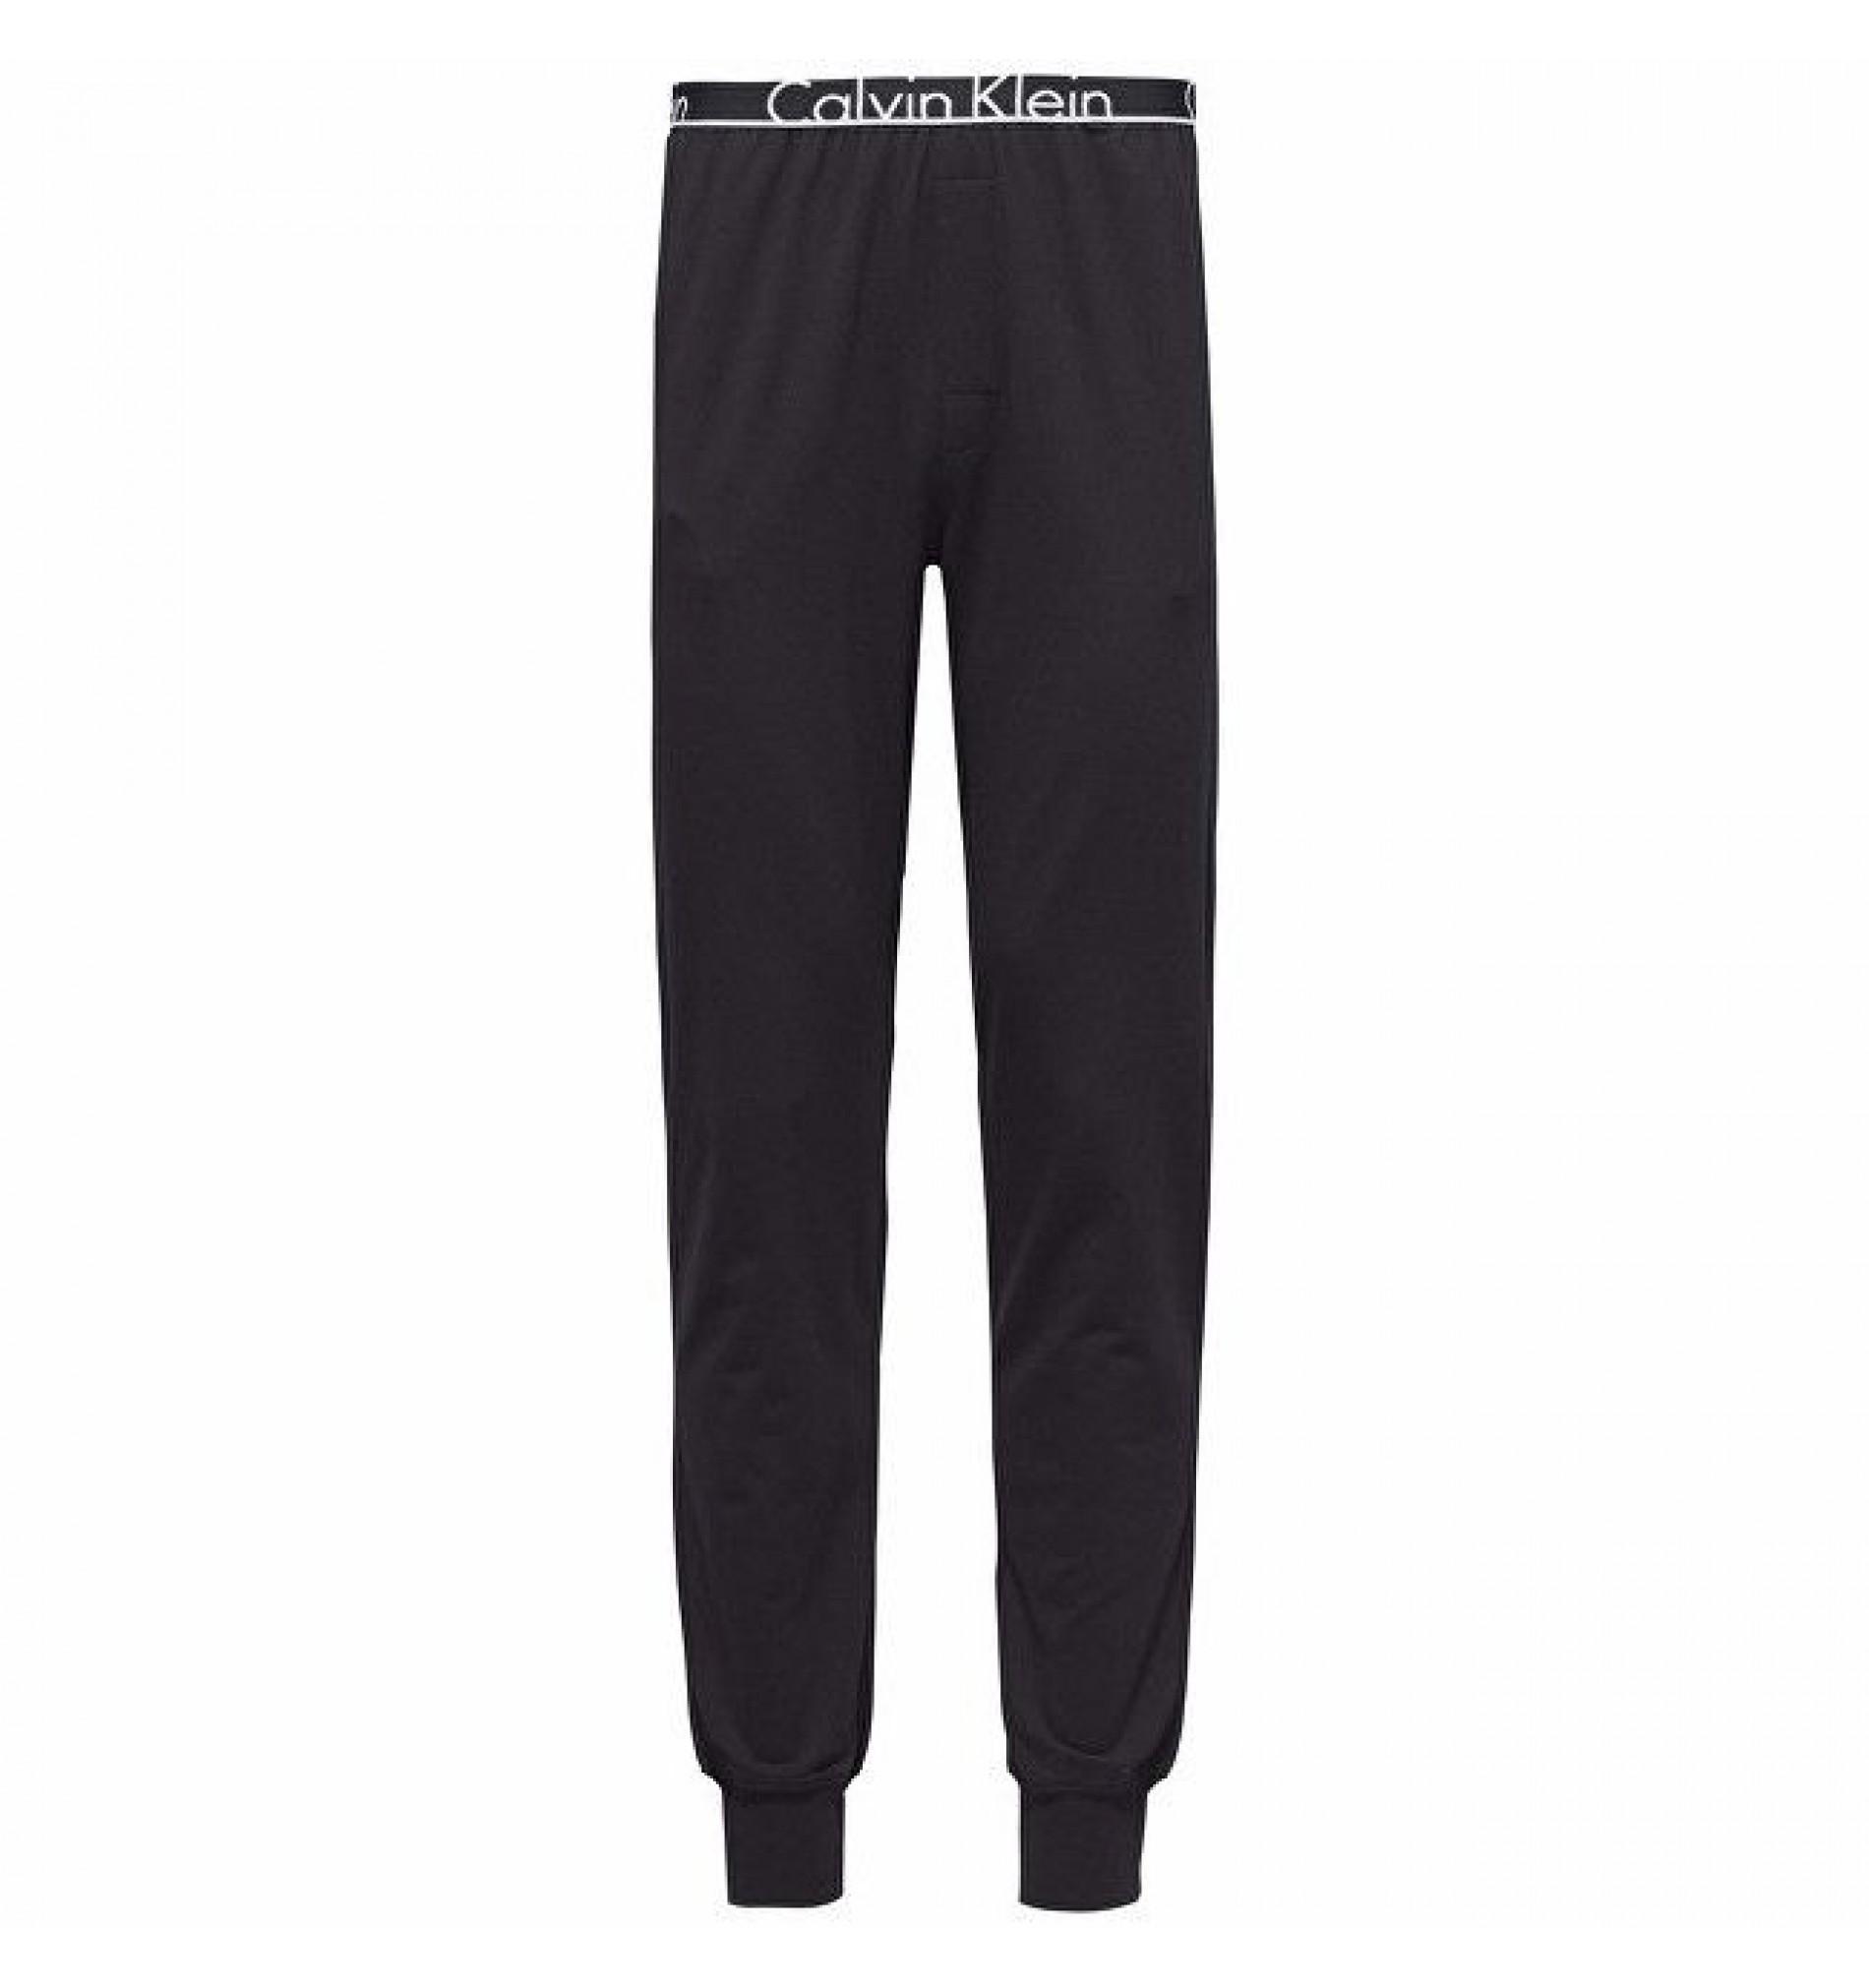 pánske nohavice - JOGGER 'ID COTTON' čierne  001